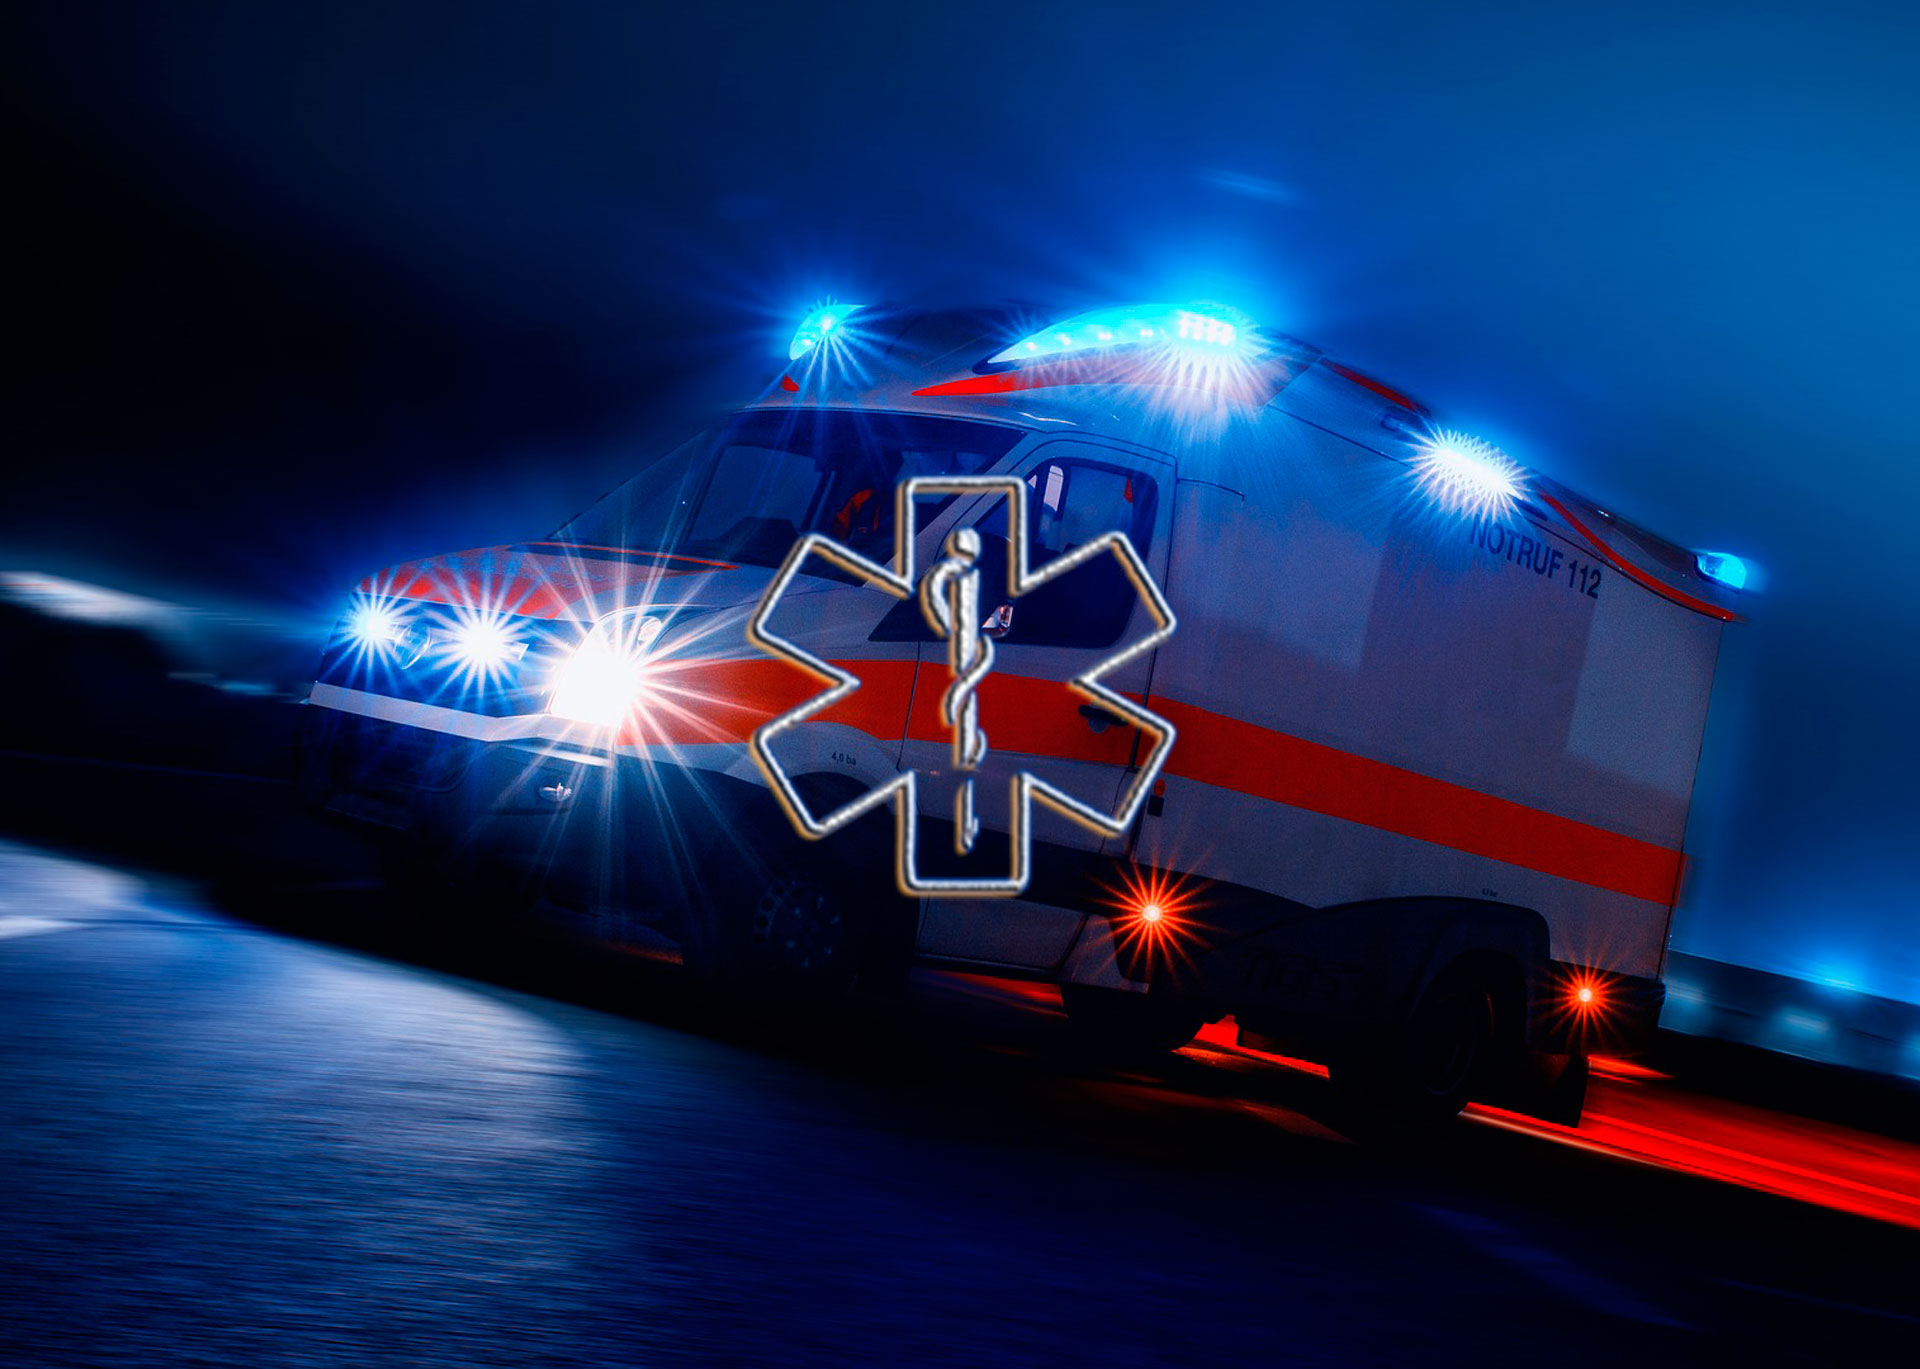 Ambulance Department